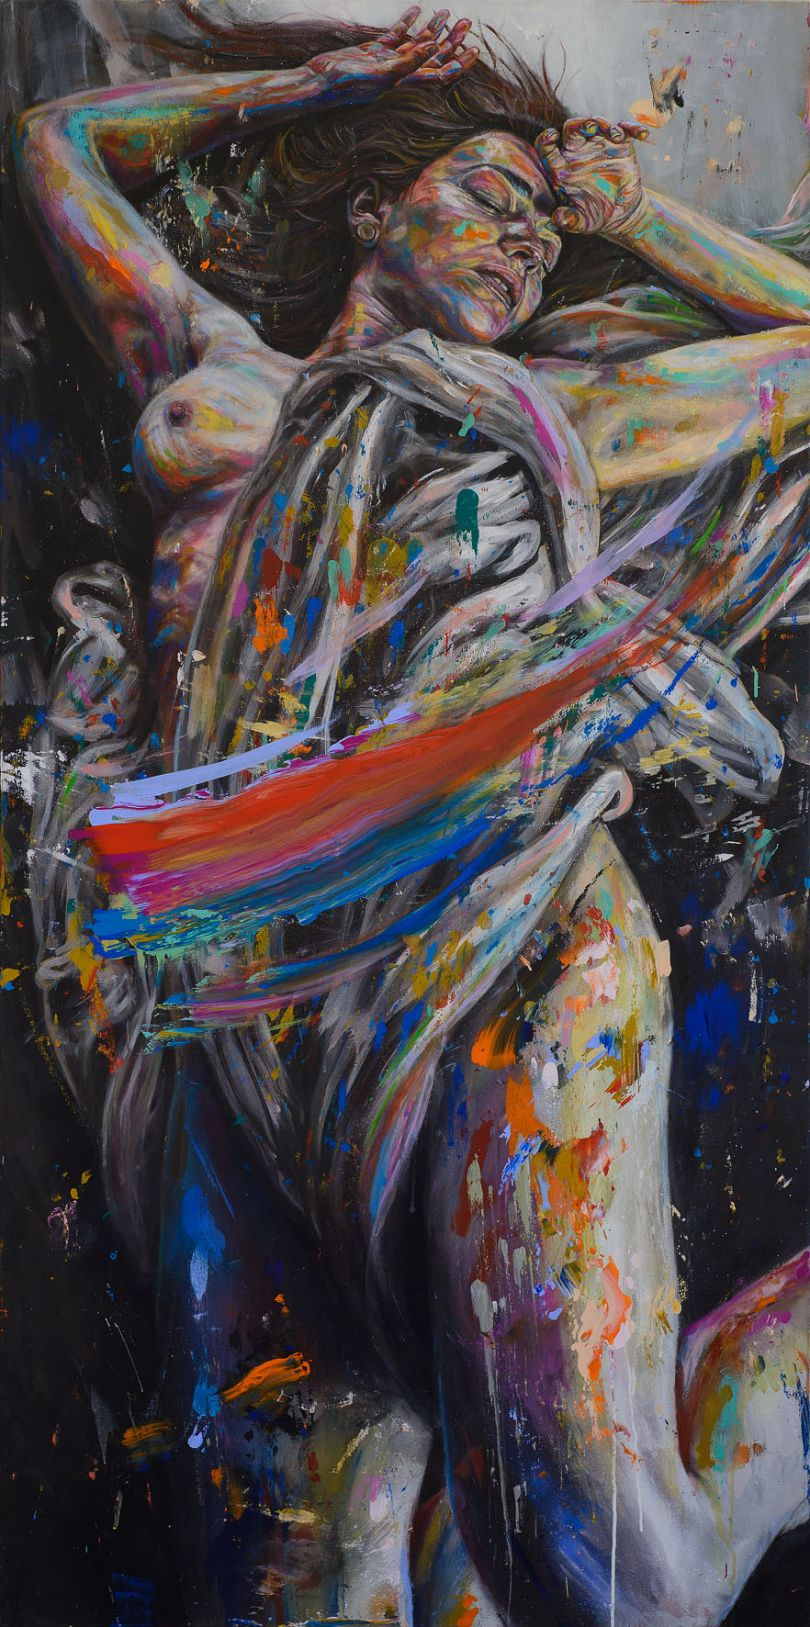 'Yesterday's Snow' acrylic and spray paint on canvas 100cm x 200cm